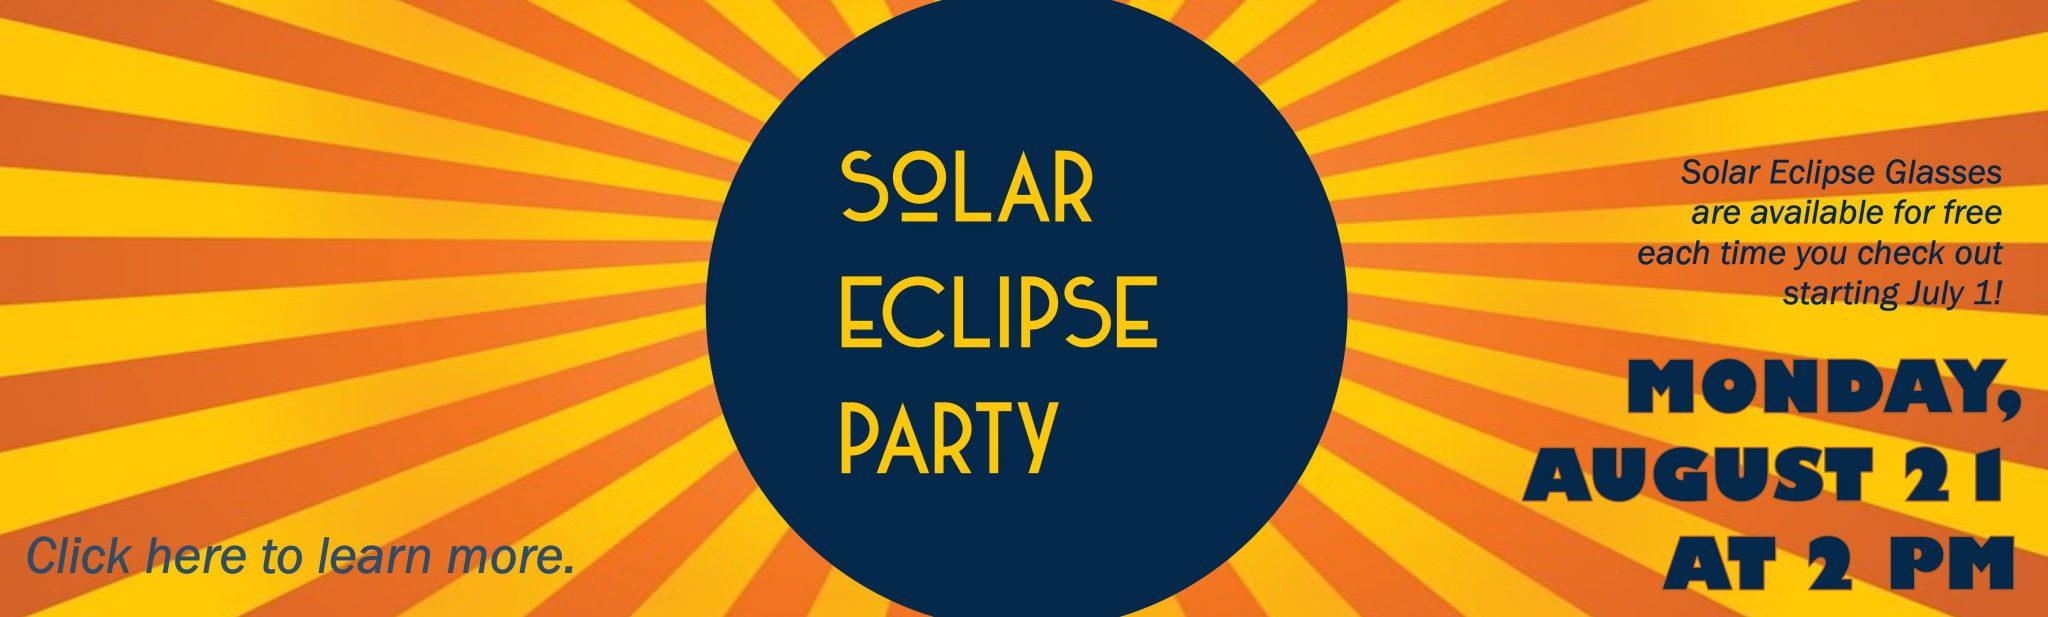 08-21-17 solar eclipse party